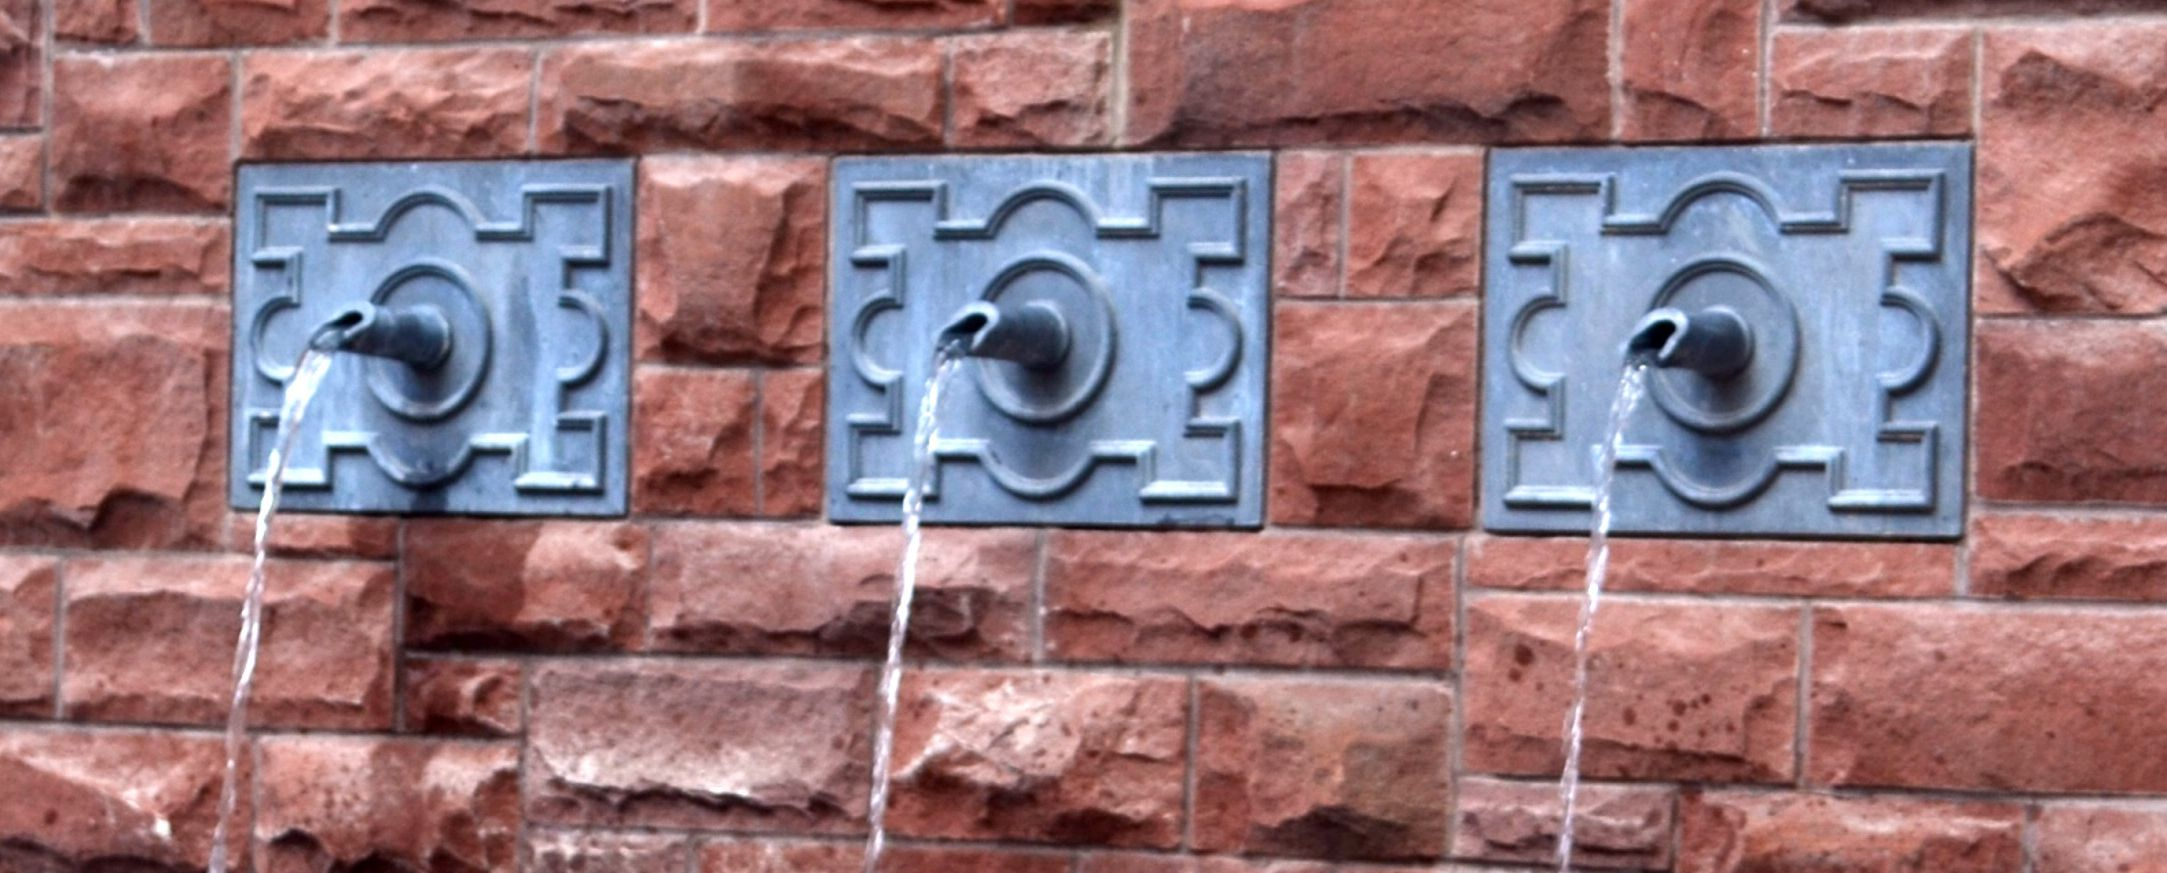 Sanford Spouts with Beaumont escutcheon w water